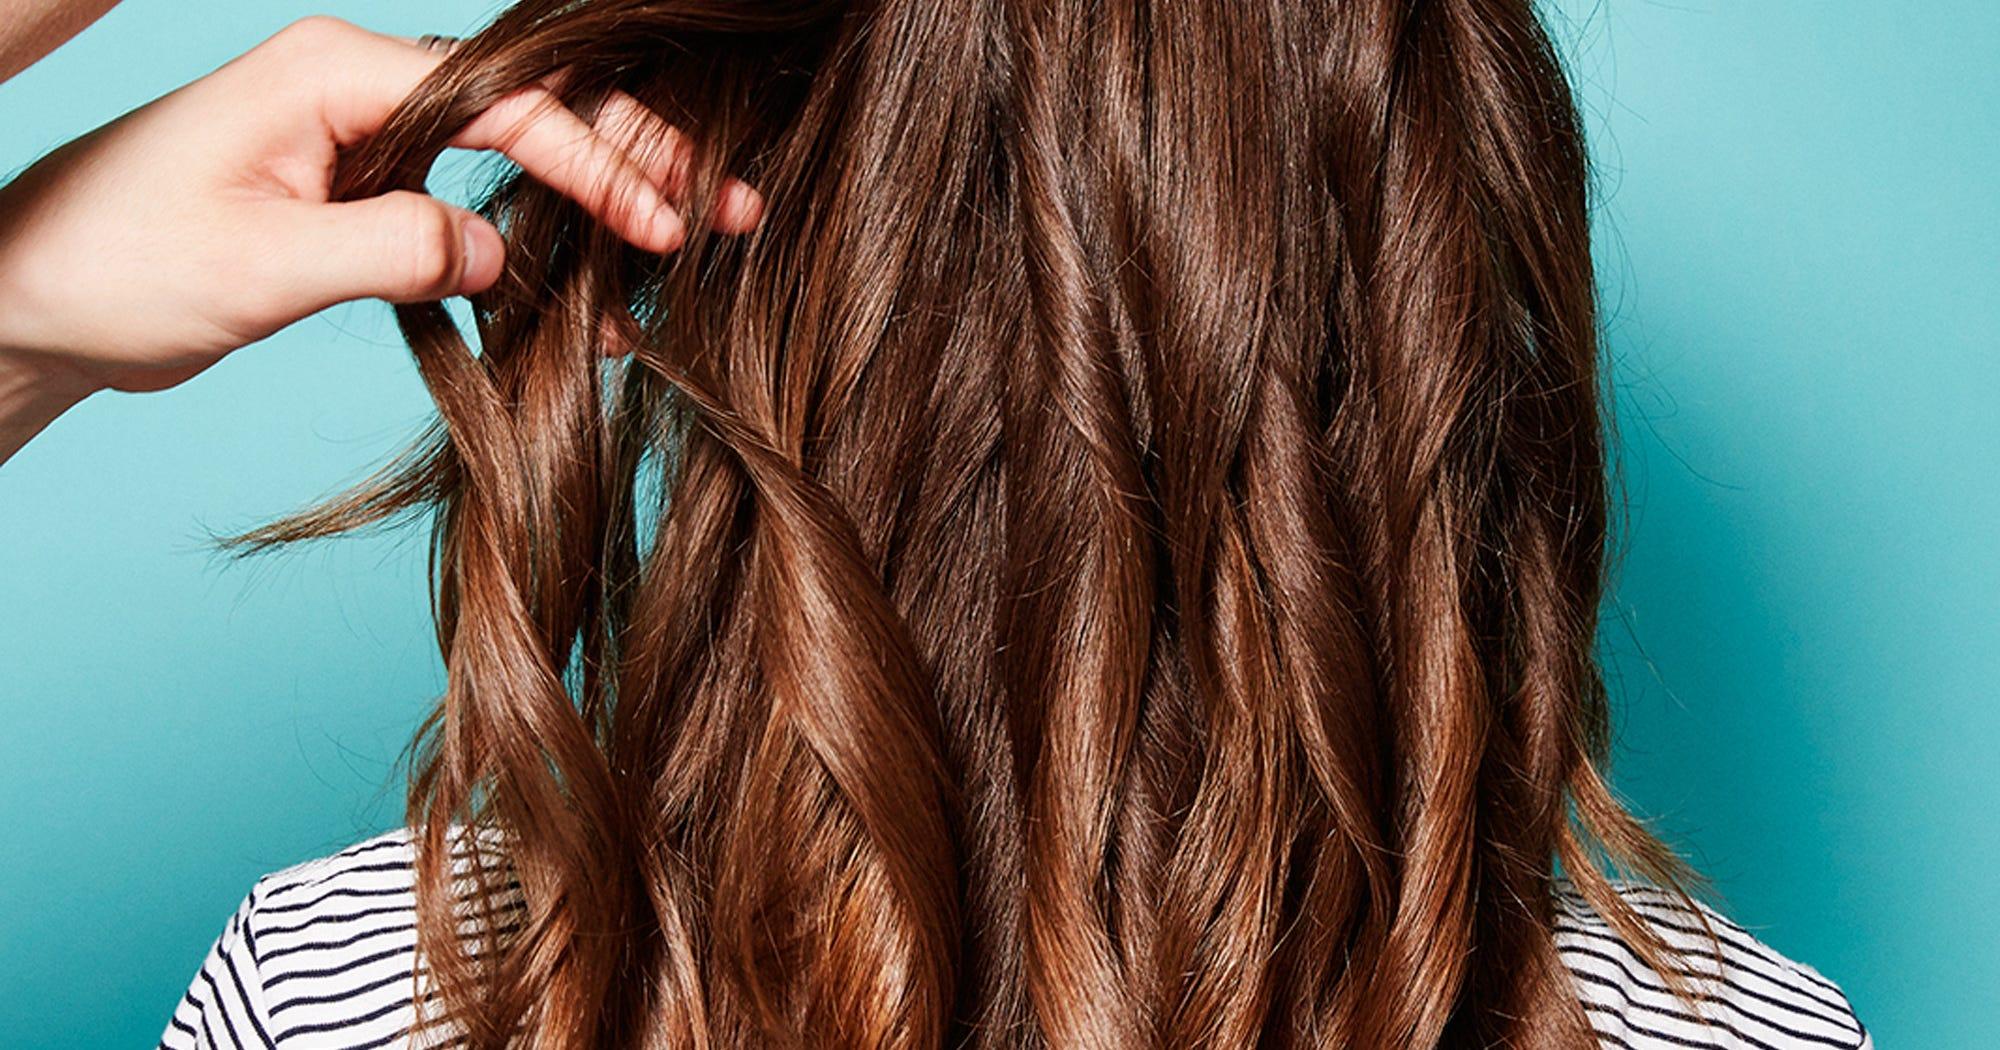 Lange haare verknoten schnell